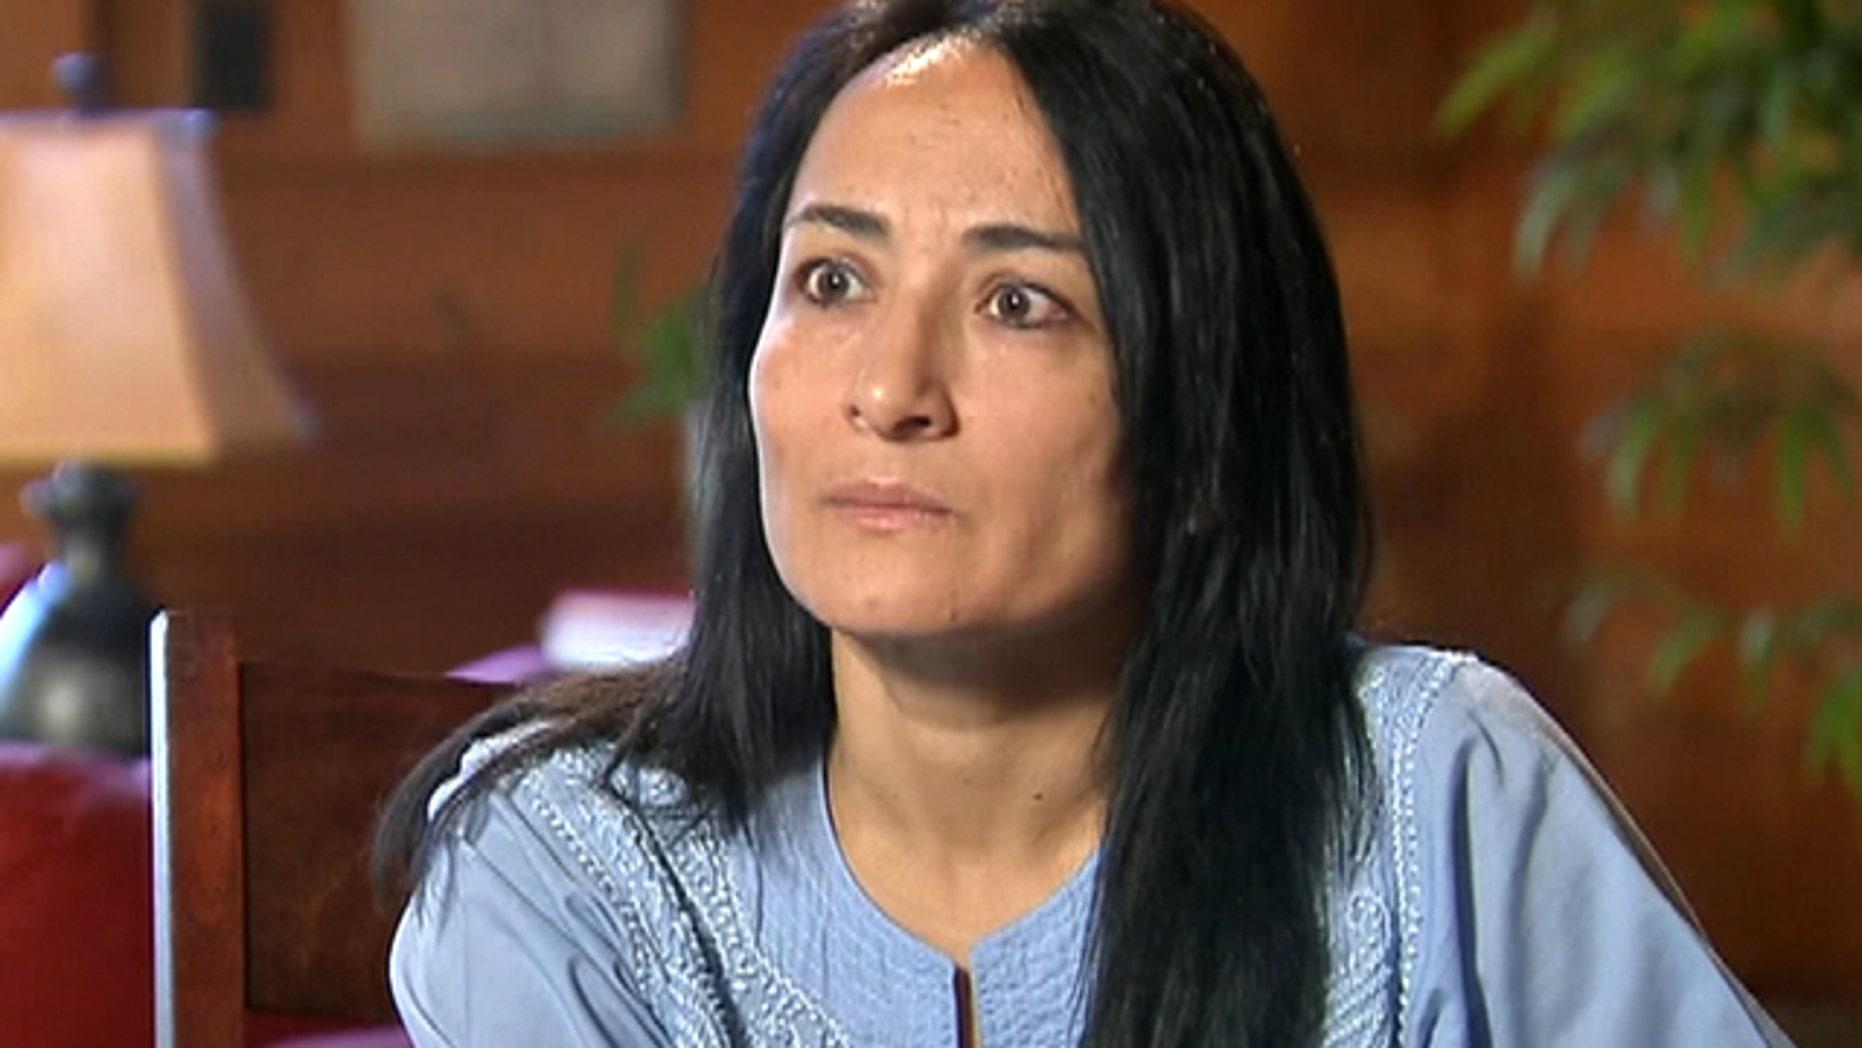 March 12, 2012: Journalist Asra Nomani is interviewed in suburban Washington.